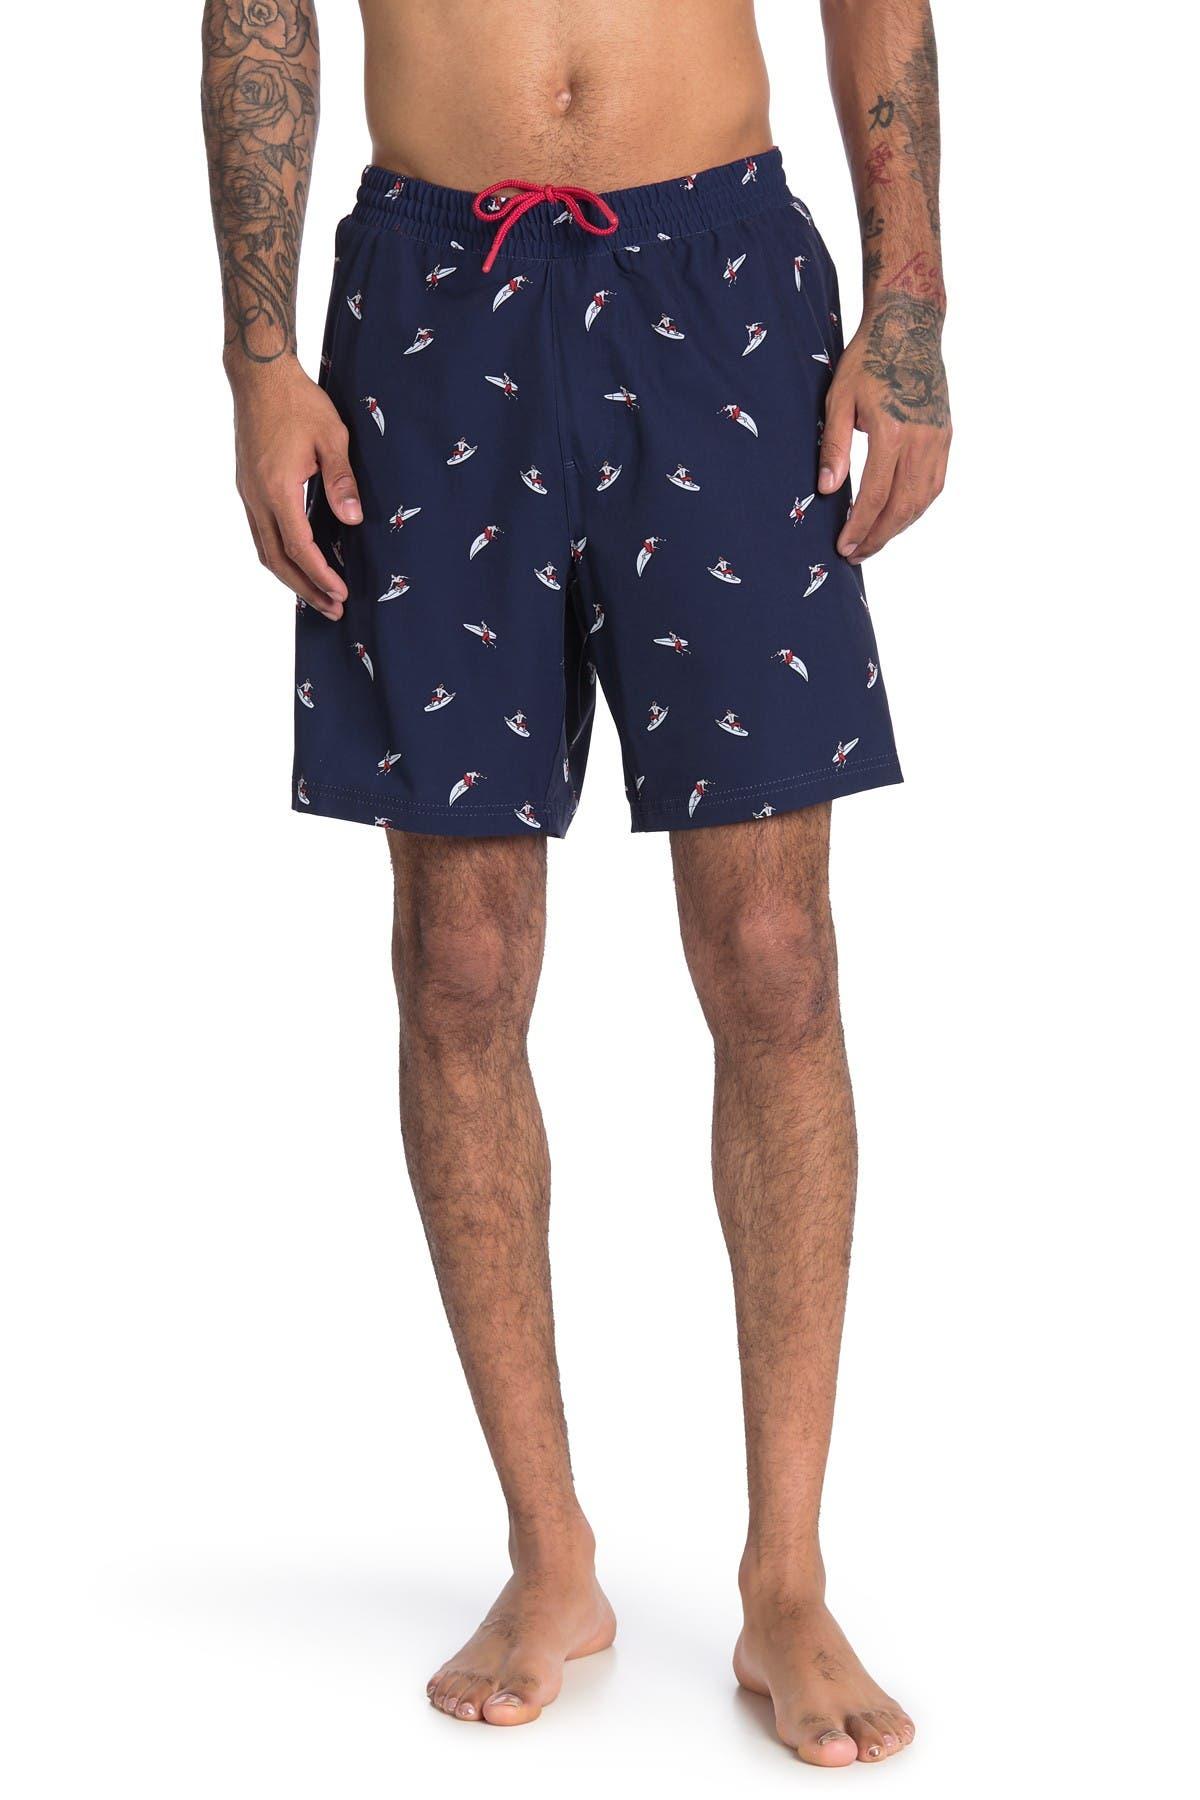 Image of Trunks Surf and Swim CO. Surfer Print Swim Shorts